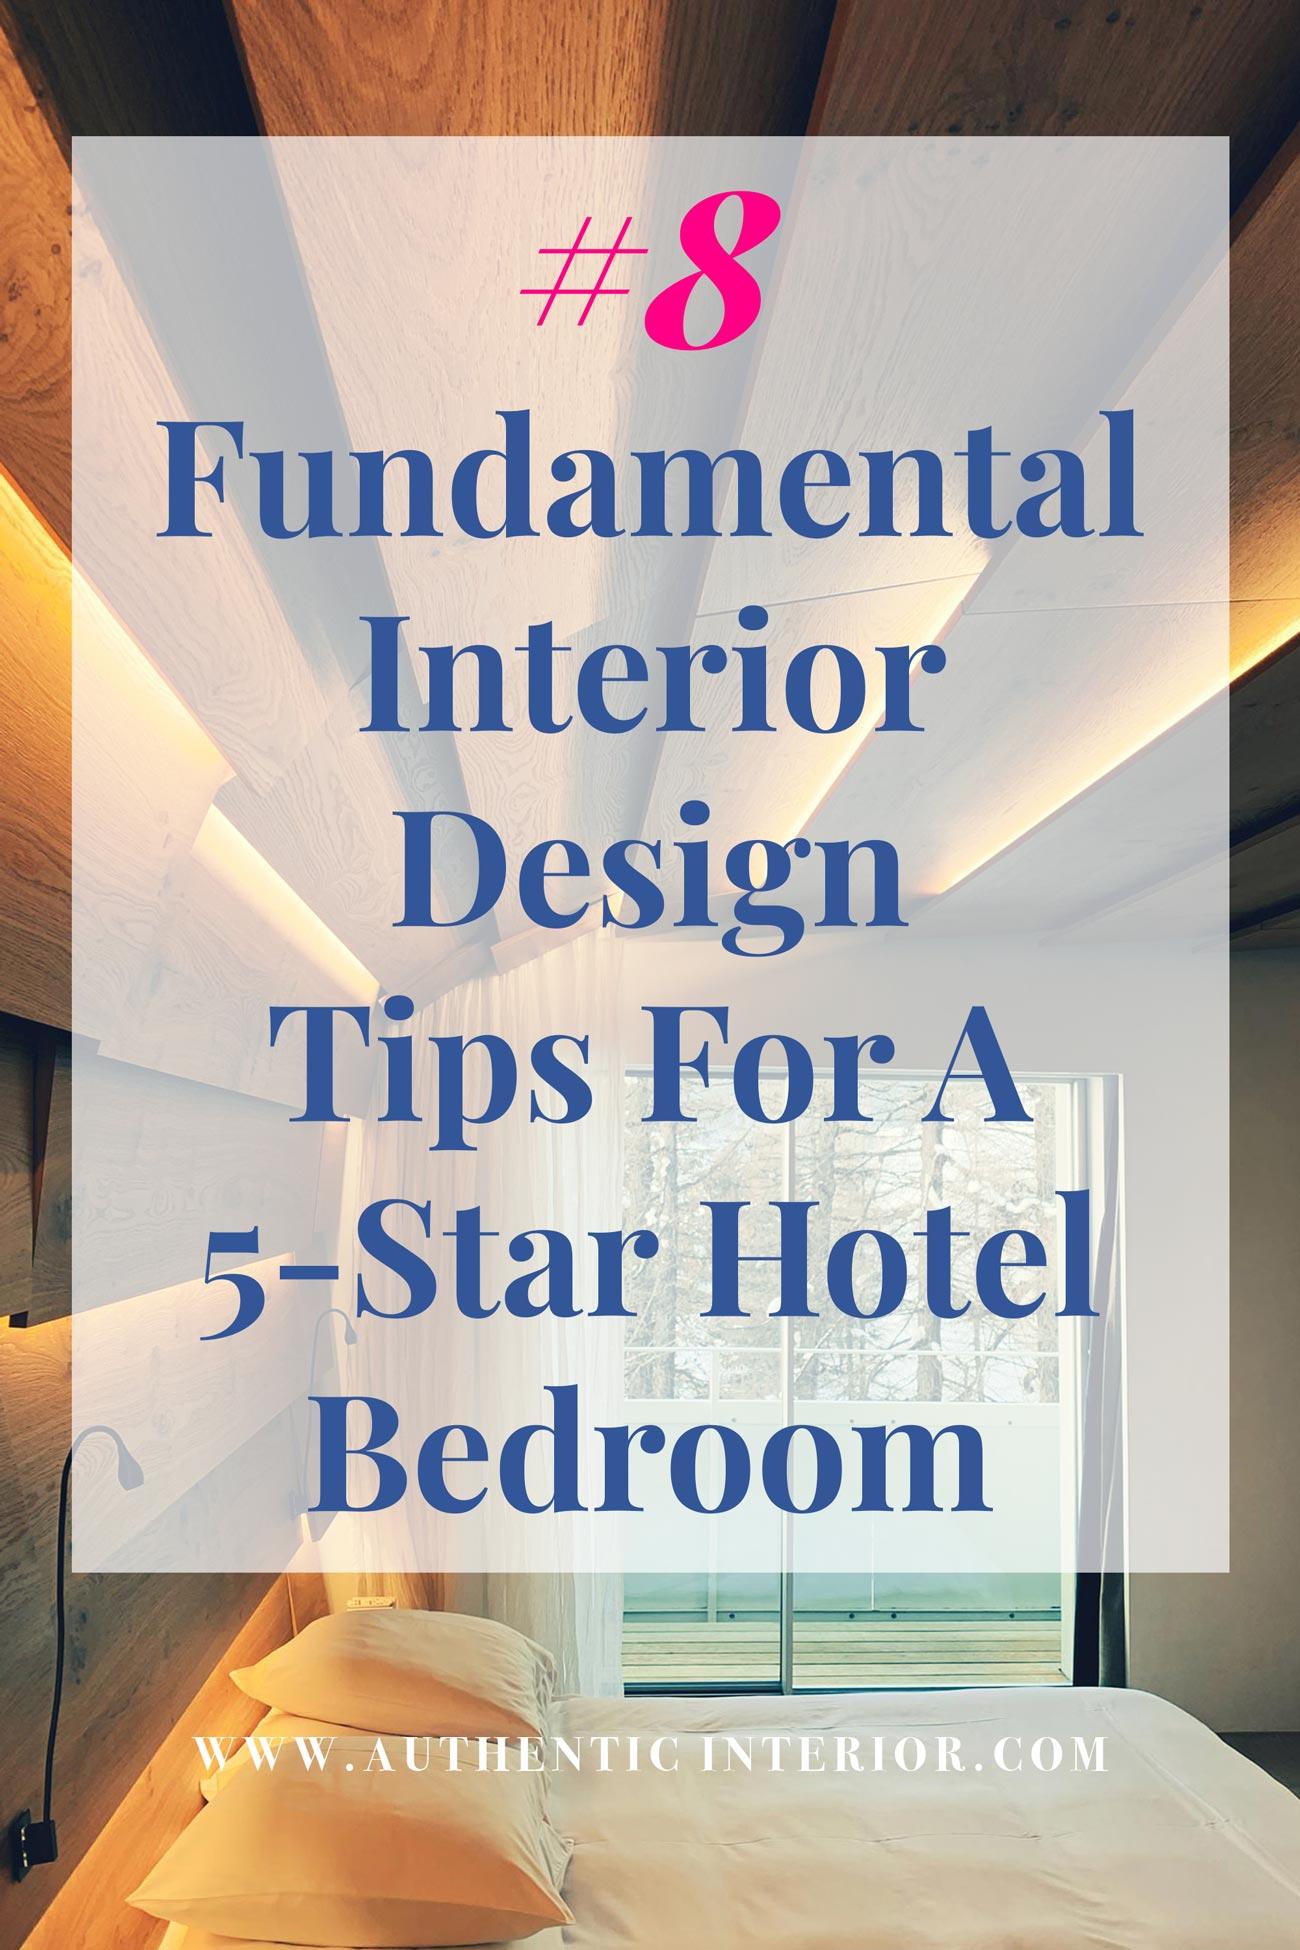 Interior-Design-Tips_5-Star-Hotel-Bedroom_authentic-interior-pin